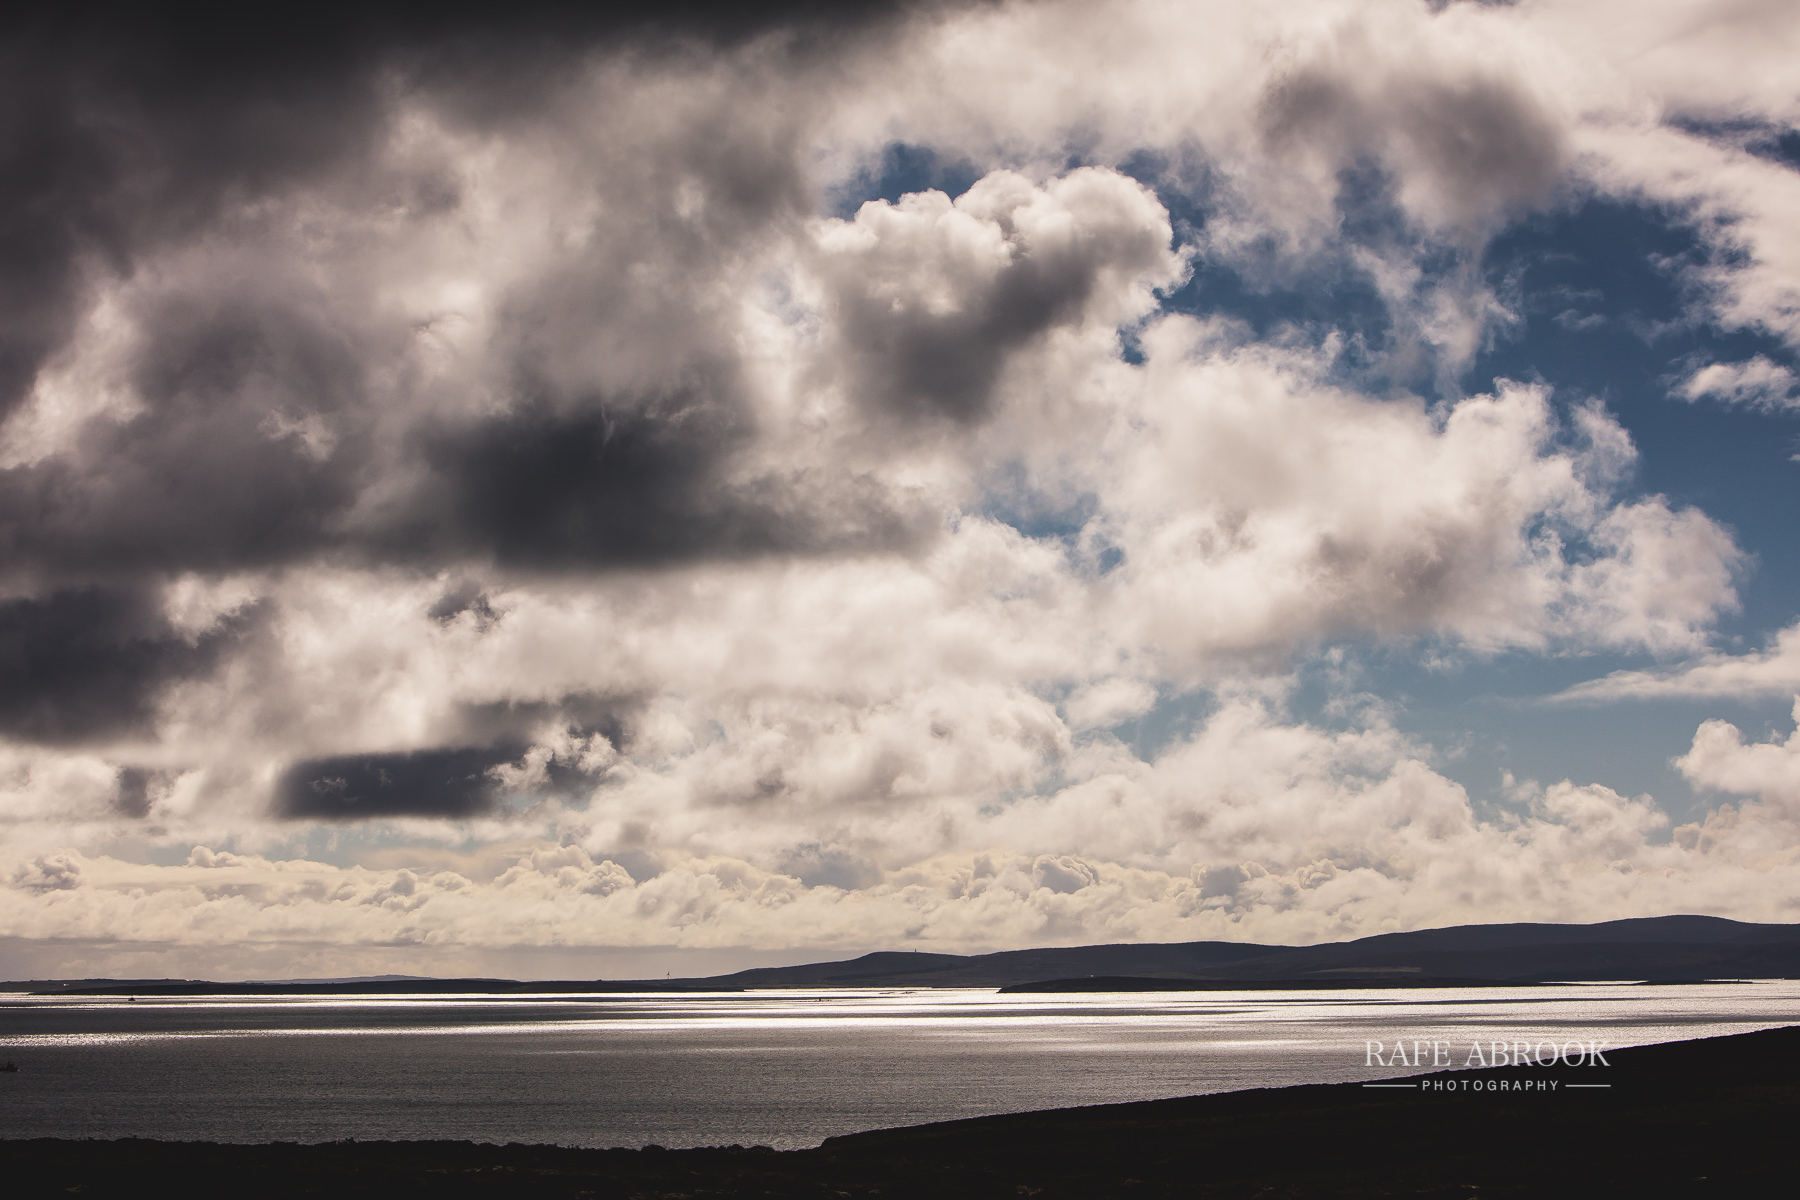 north coast 500 scotland porsche cayman gt4 golf r estate rafe abrook photography-1084.jpg